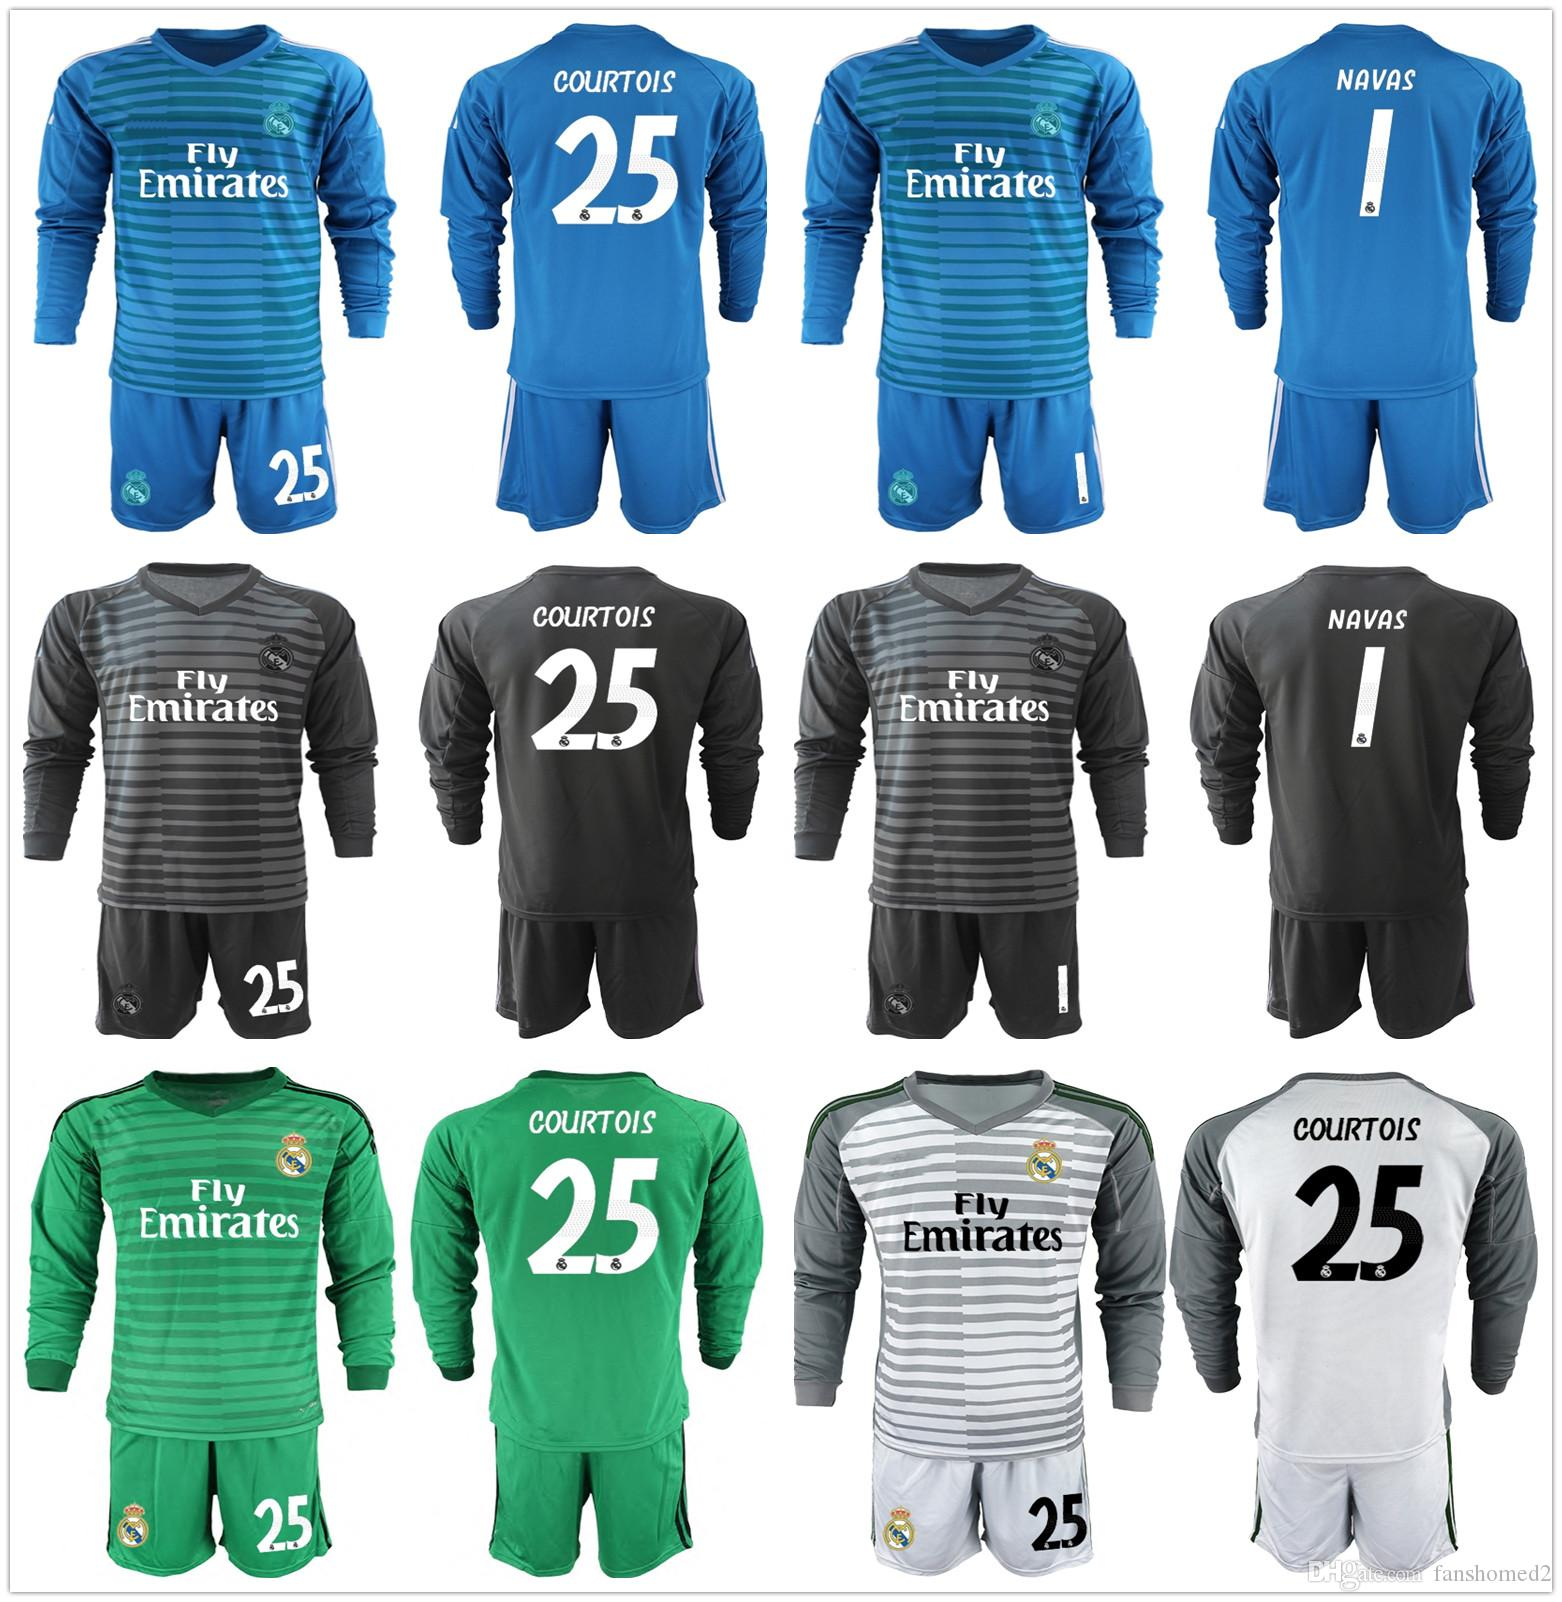 1b29a19eb8e 2019 2018 2019 Long Sleeve Real Madrid Soccer Set Goalkeepe Kit Keylor  Navas 25 Courtois Goalkeeper Madrid Jersey Bale Shirt Full Uniform Men From  ...